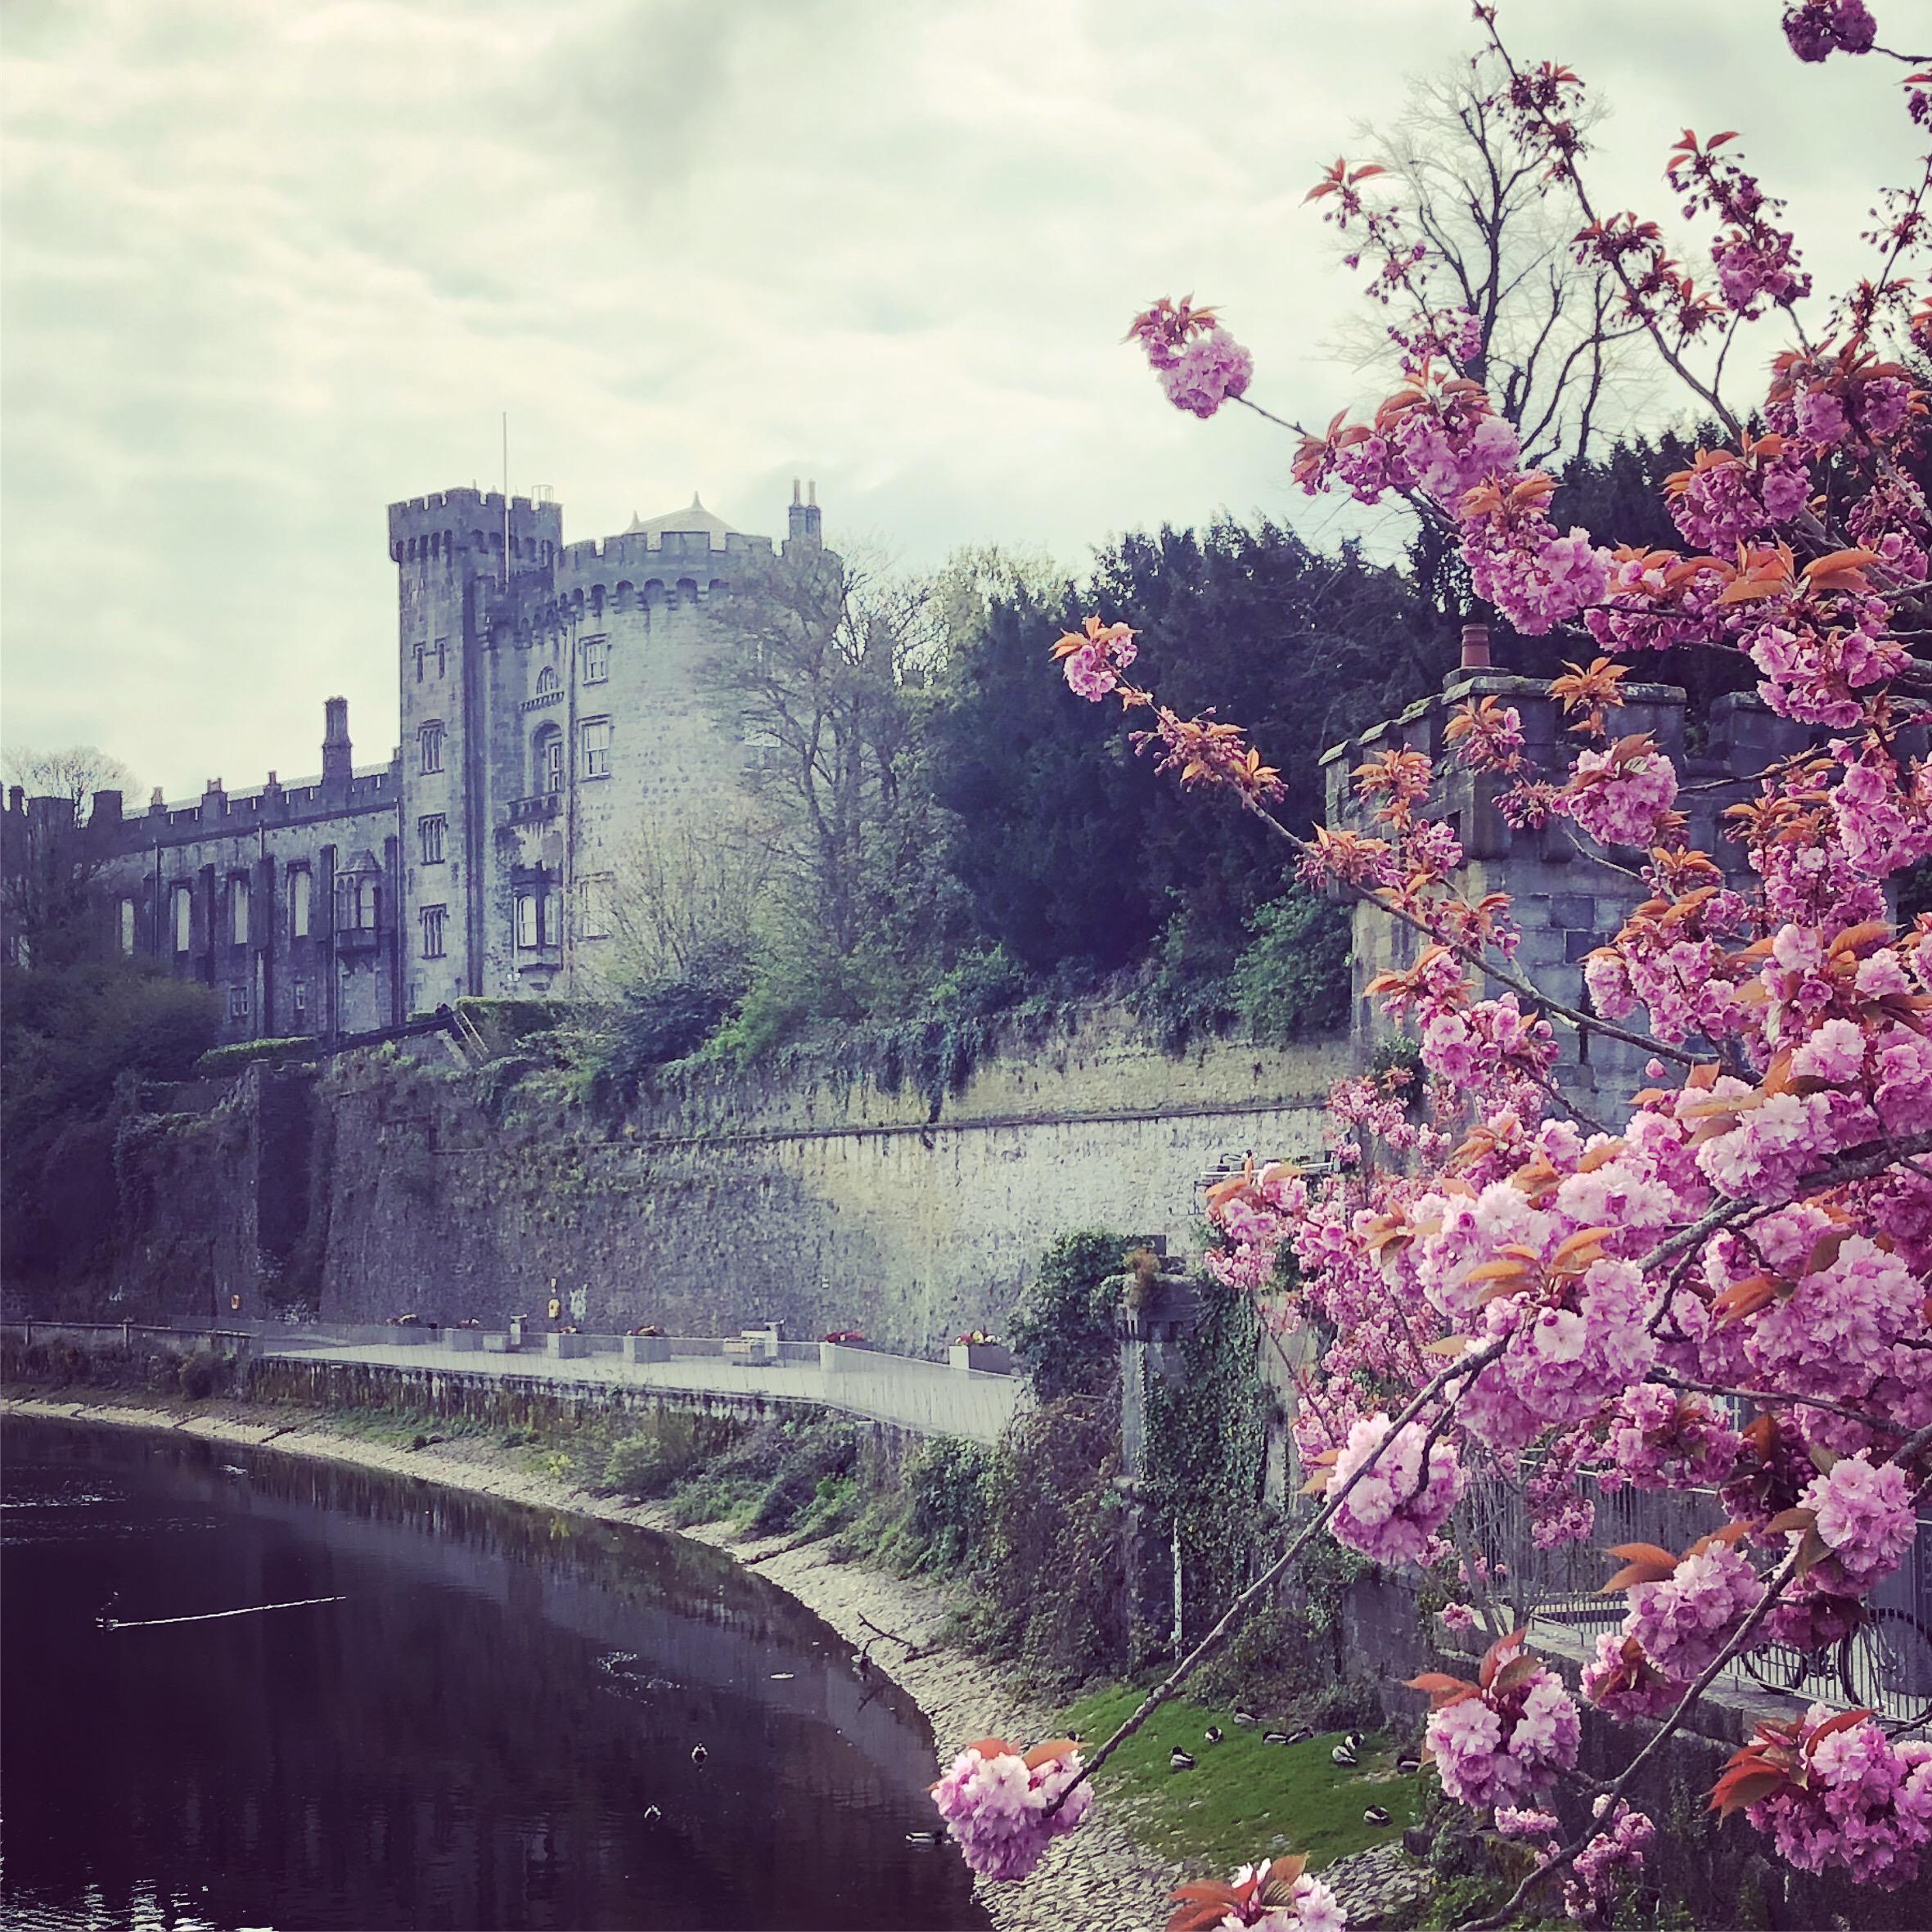 Wanderlust-Travel-blog-small-group-travel-Ireland